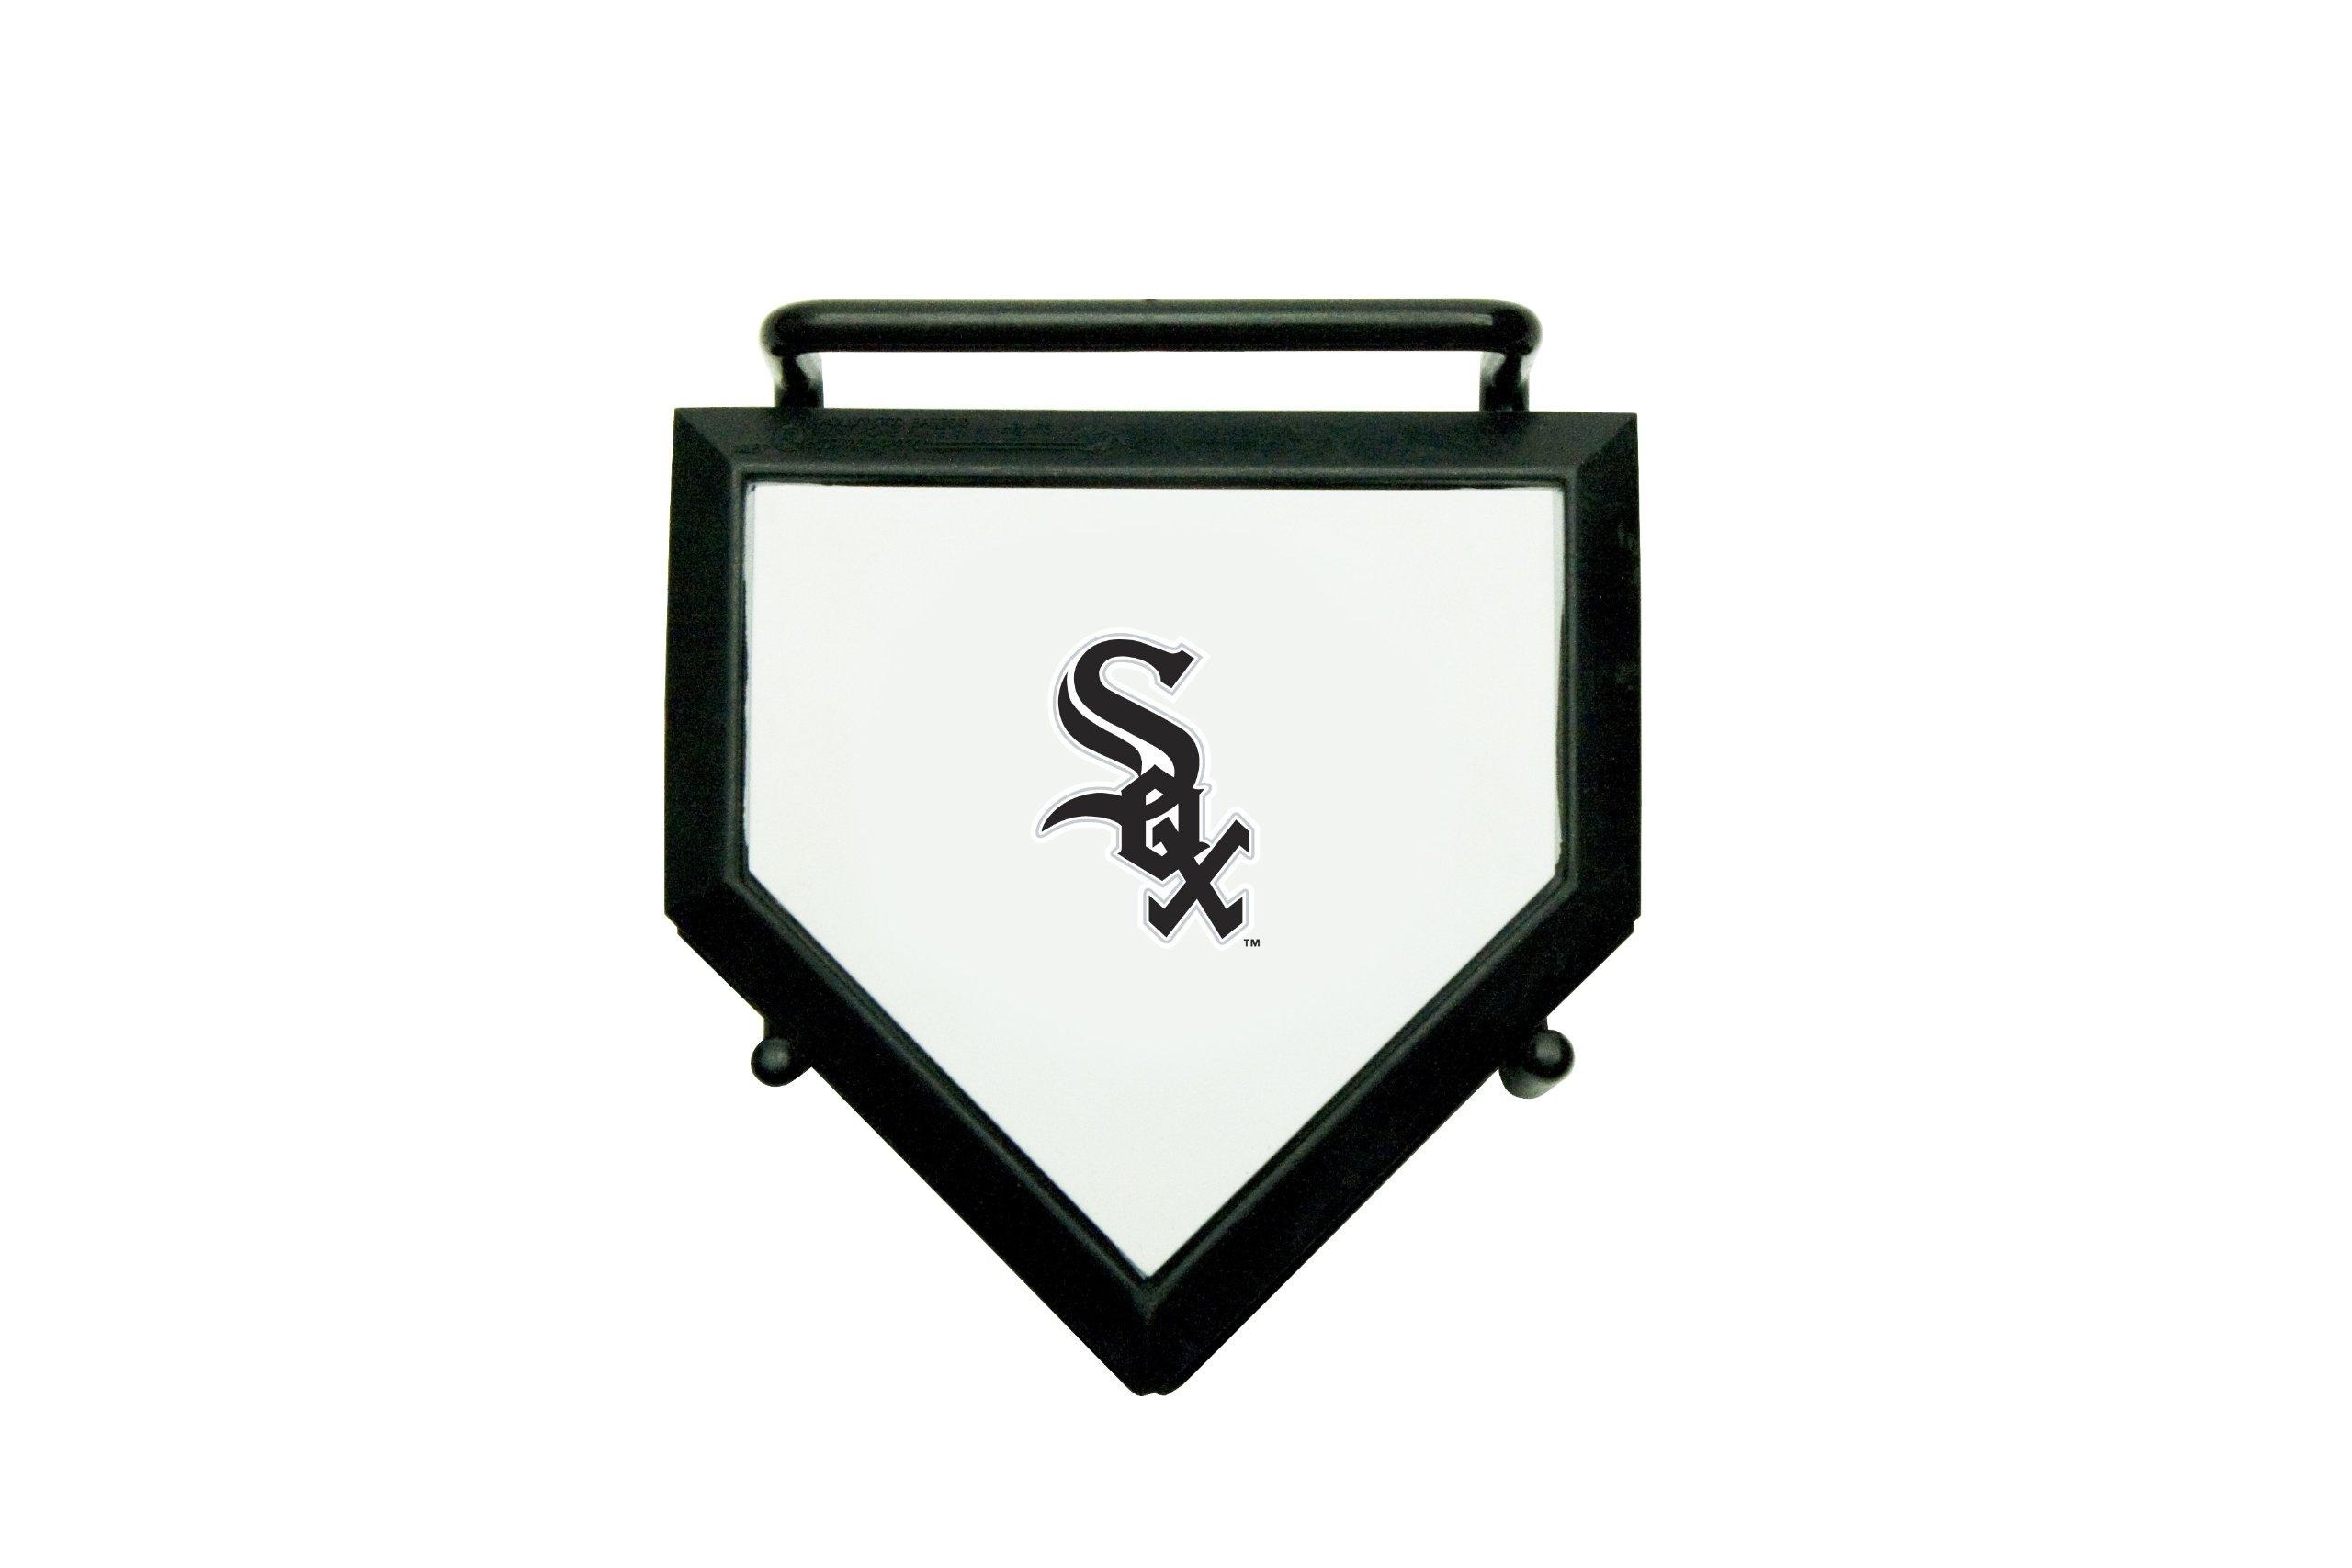 MLB Chicago White Sox Home Plate 4-pack Coaster Set